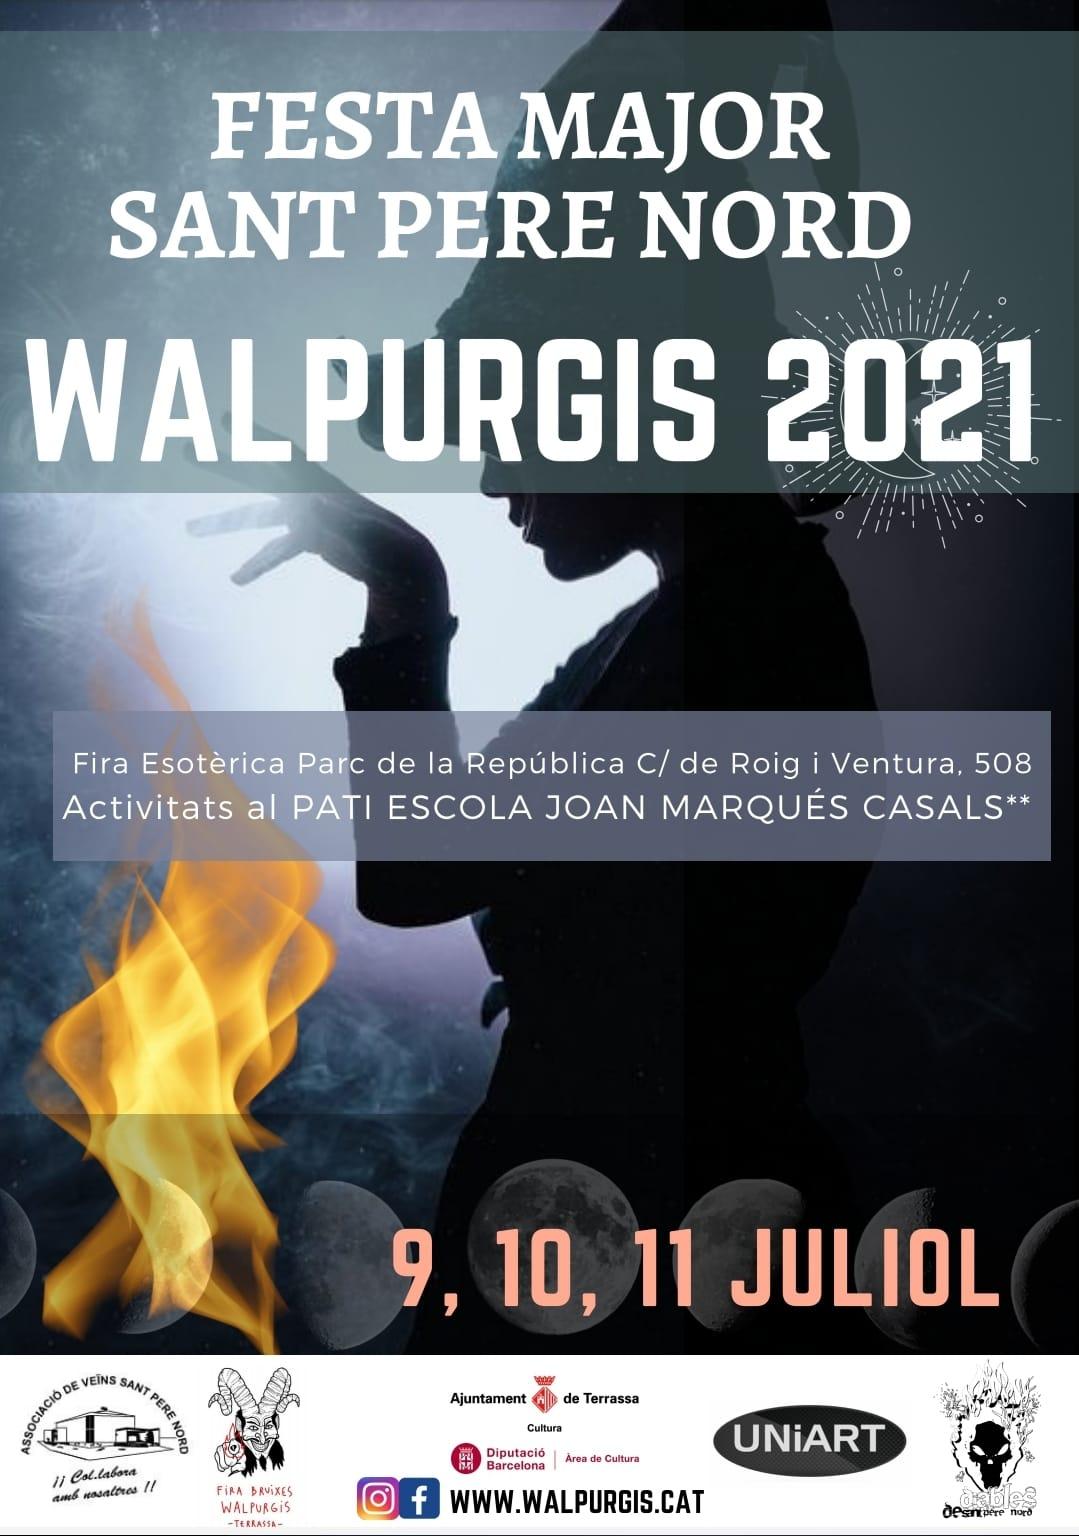 Walpurgis 2021 Sant Pere Nord